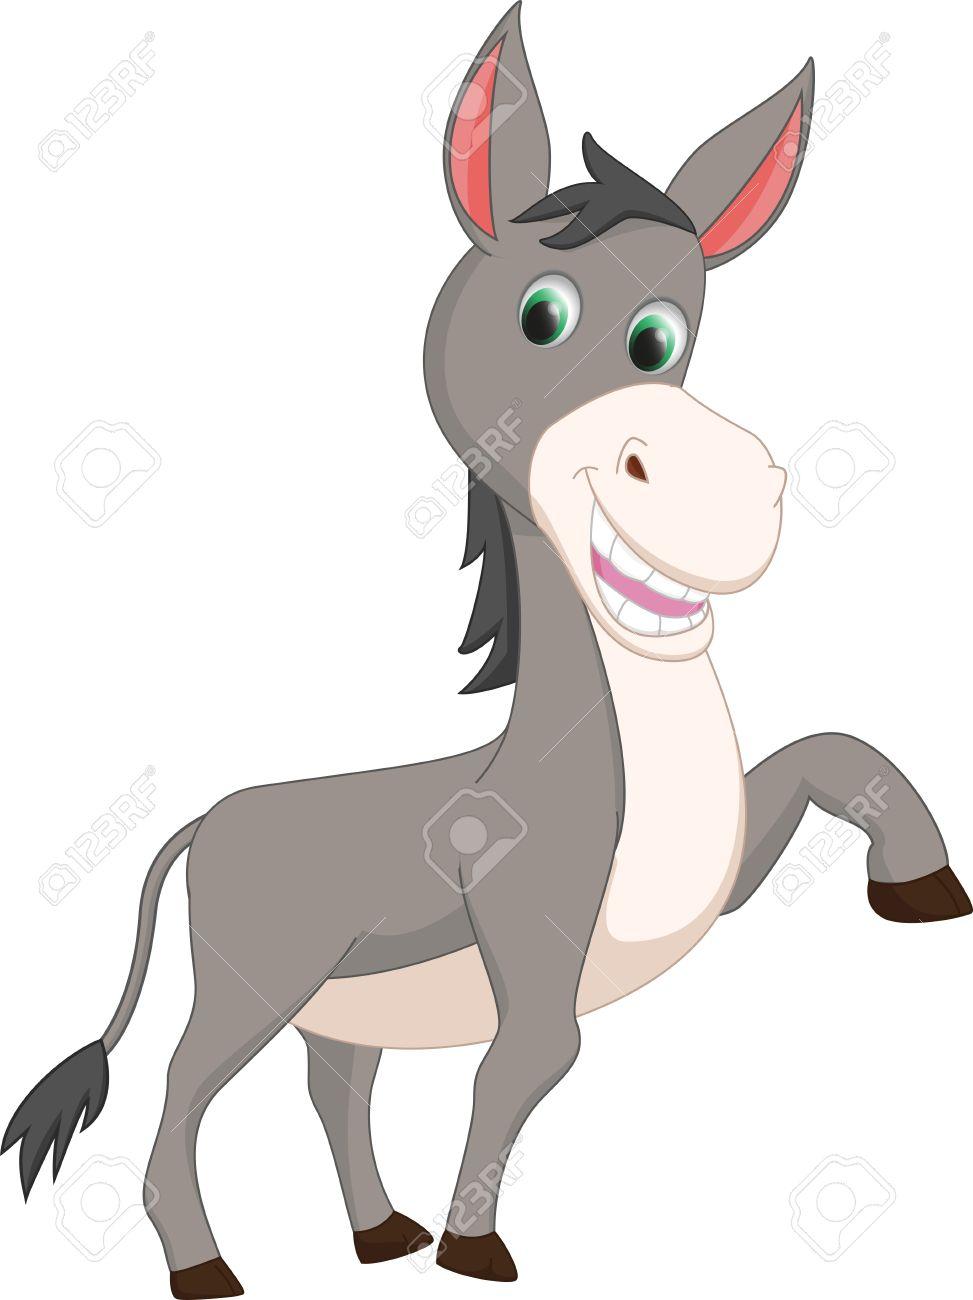 973x1300 Cute Donkey Cartoon Royalty Free Cliparts, Vectors, And Stock